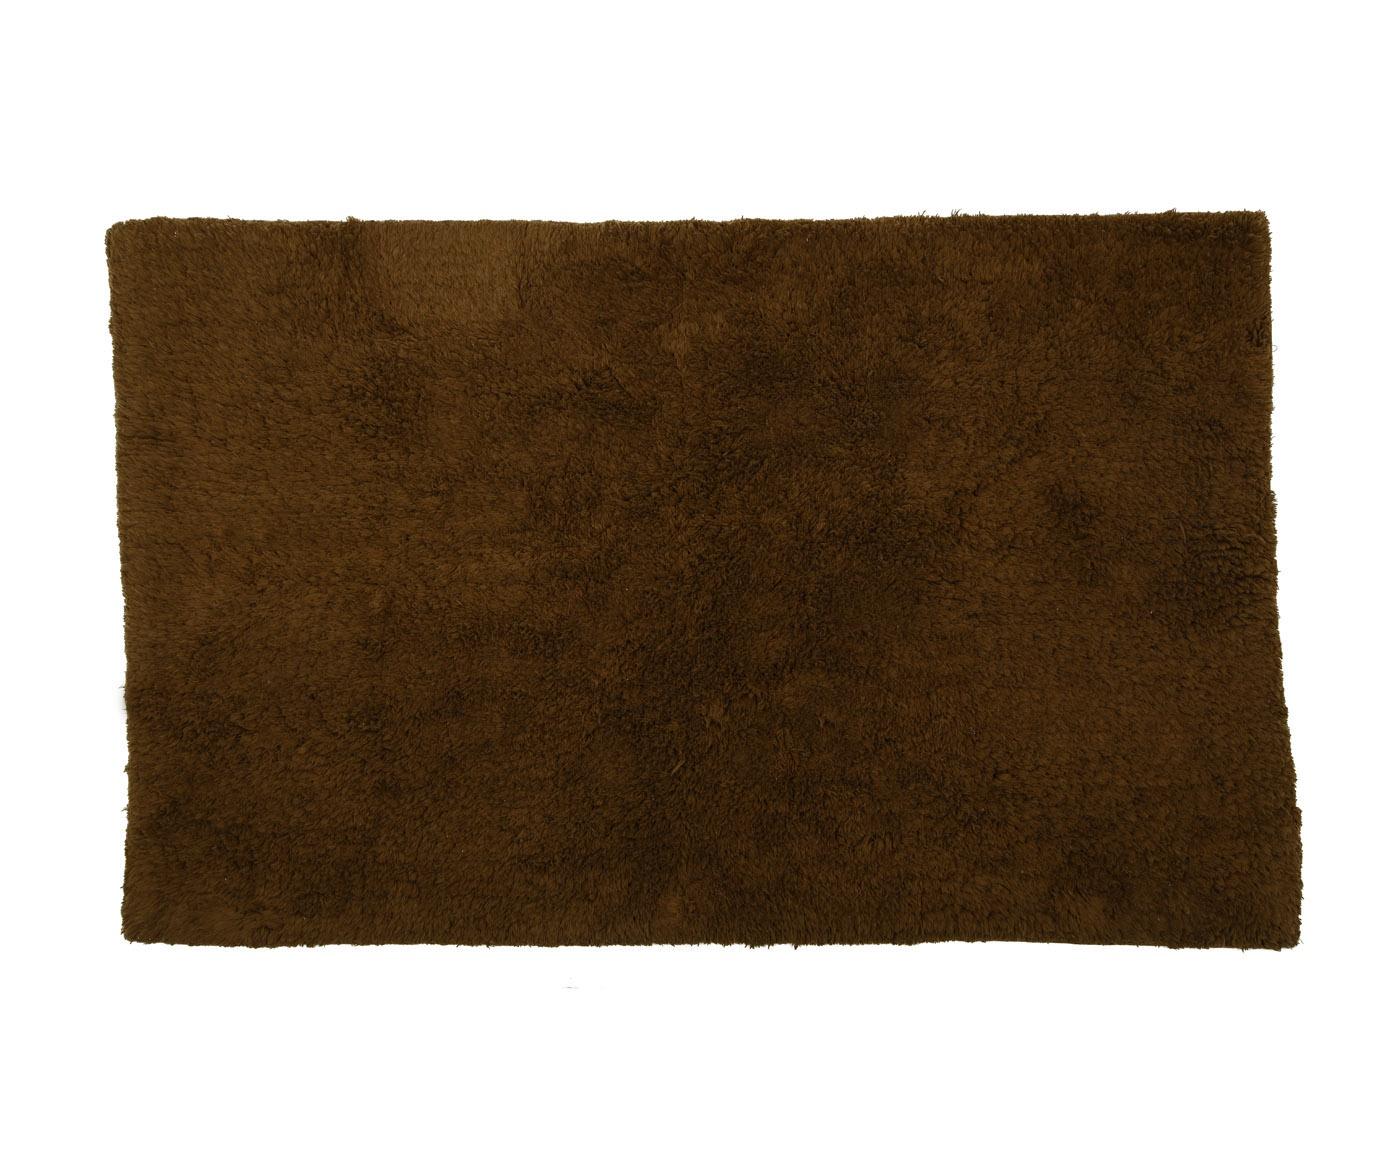 Коврик для ванной Blonder Home 50х80см Азиатский лес коврик attribute barrier 50х80см нейлон пвх